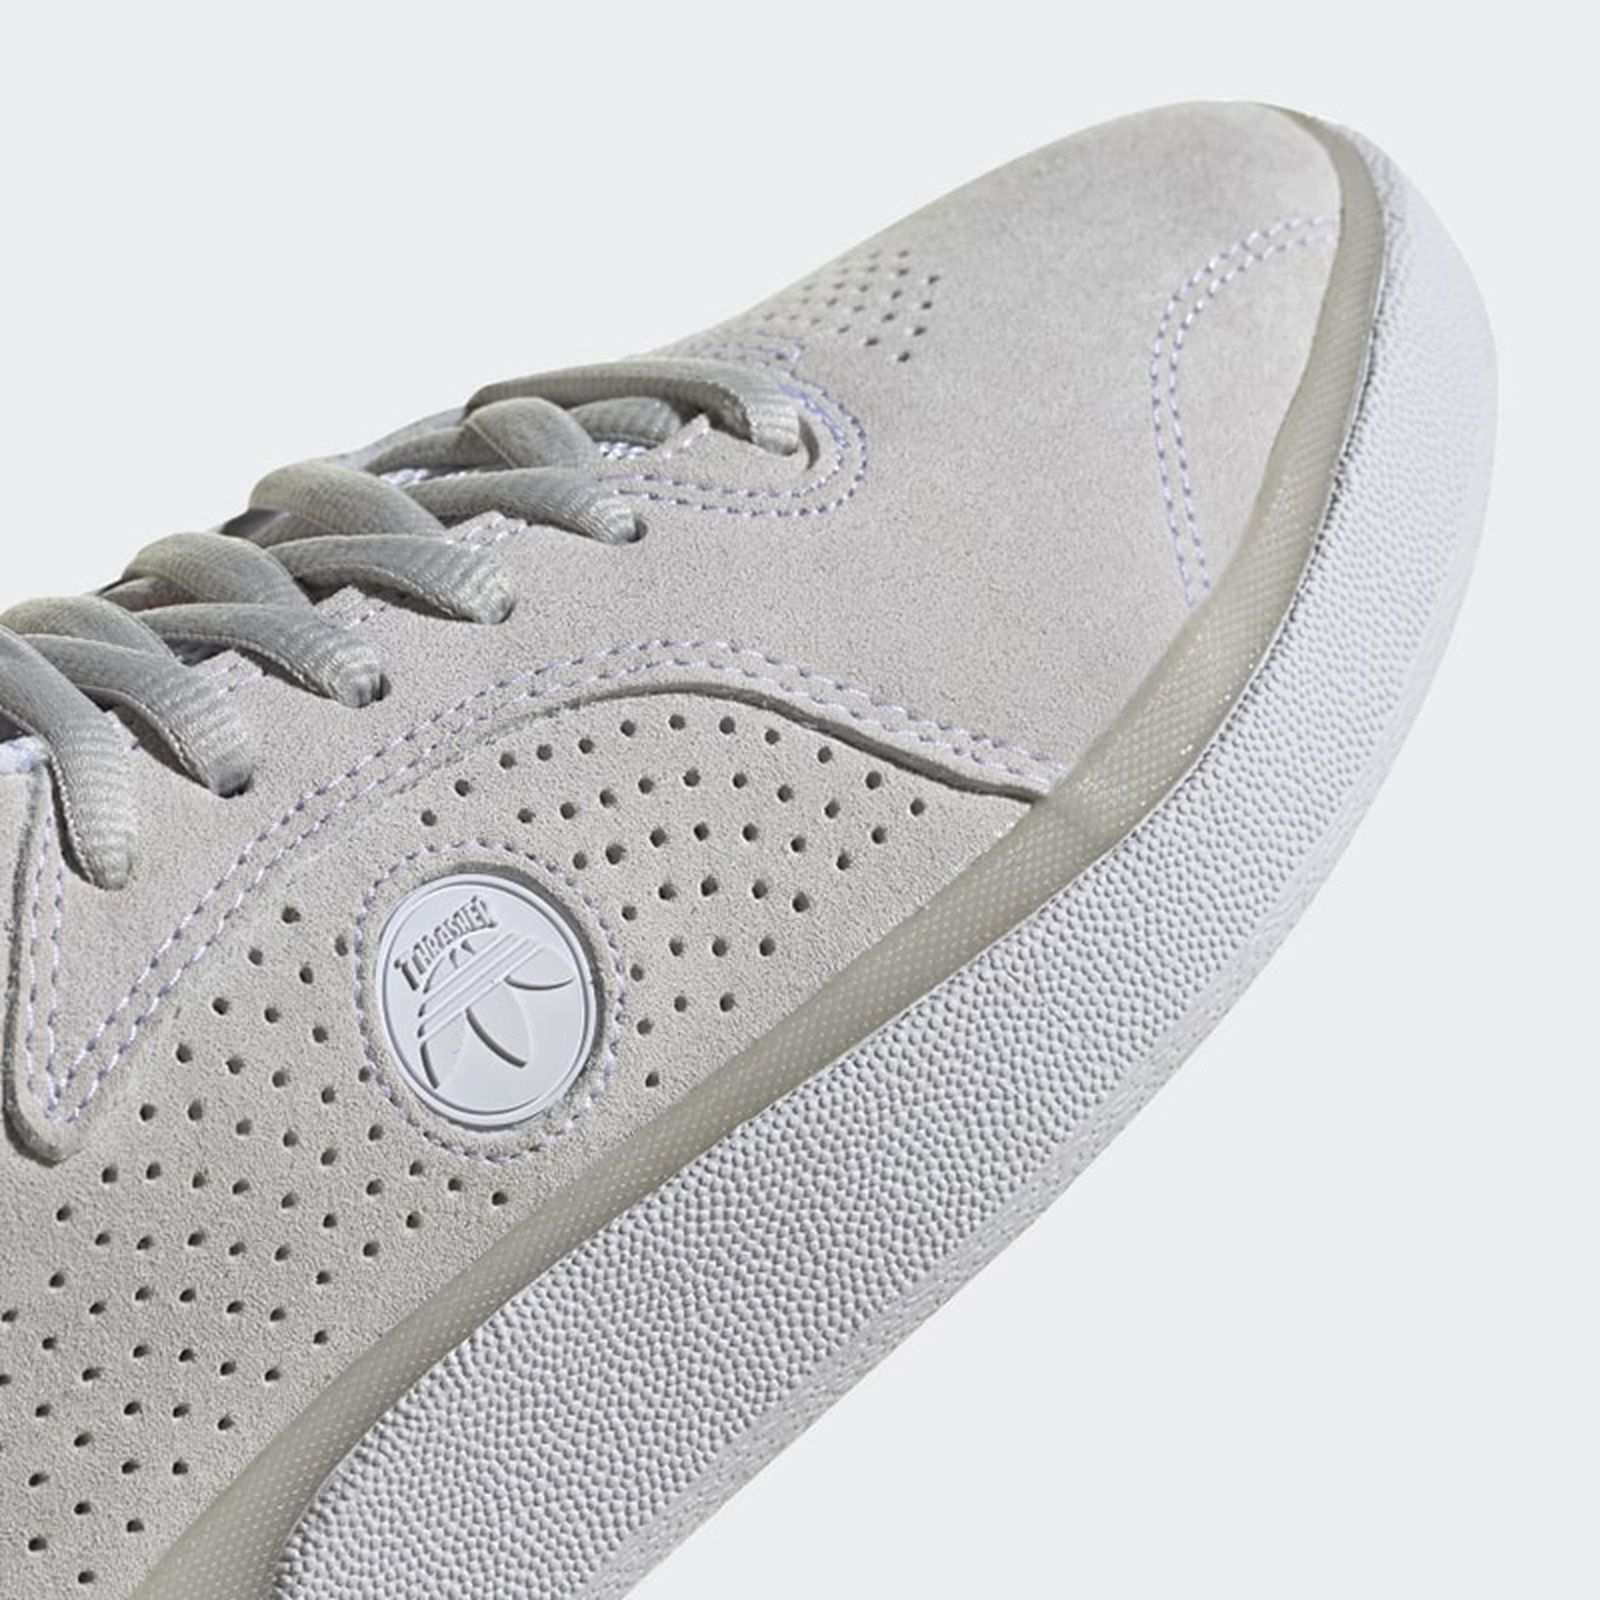 thrasher-adidas-superstar-adv-tyshawn-jones-release-date-price-1-14